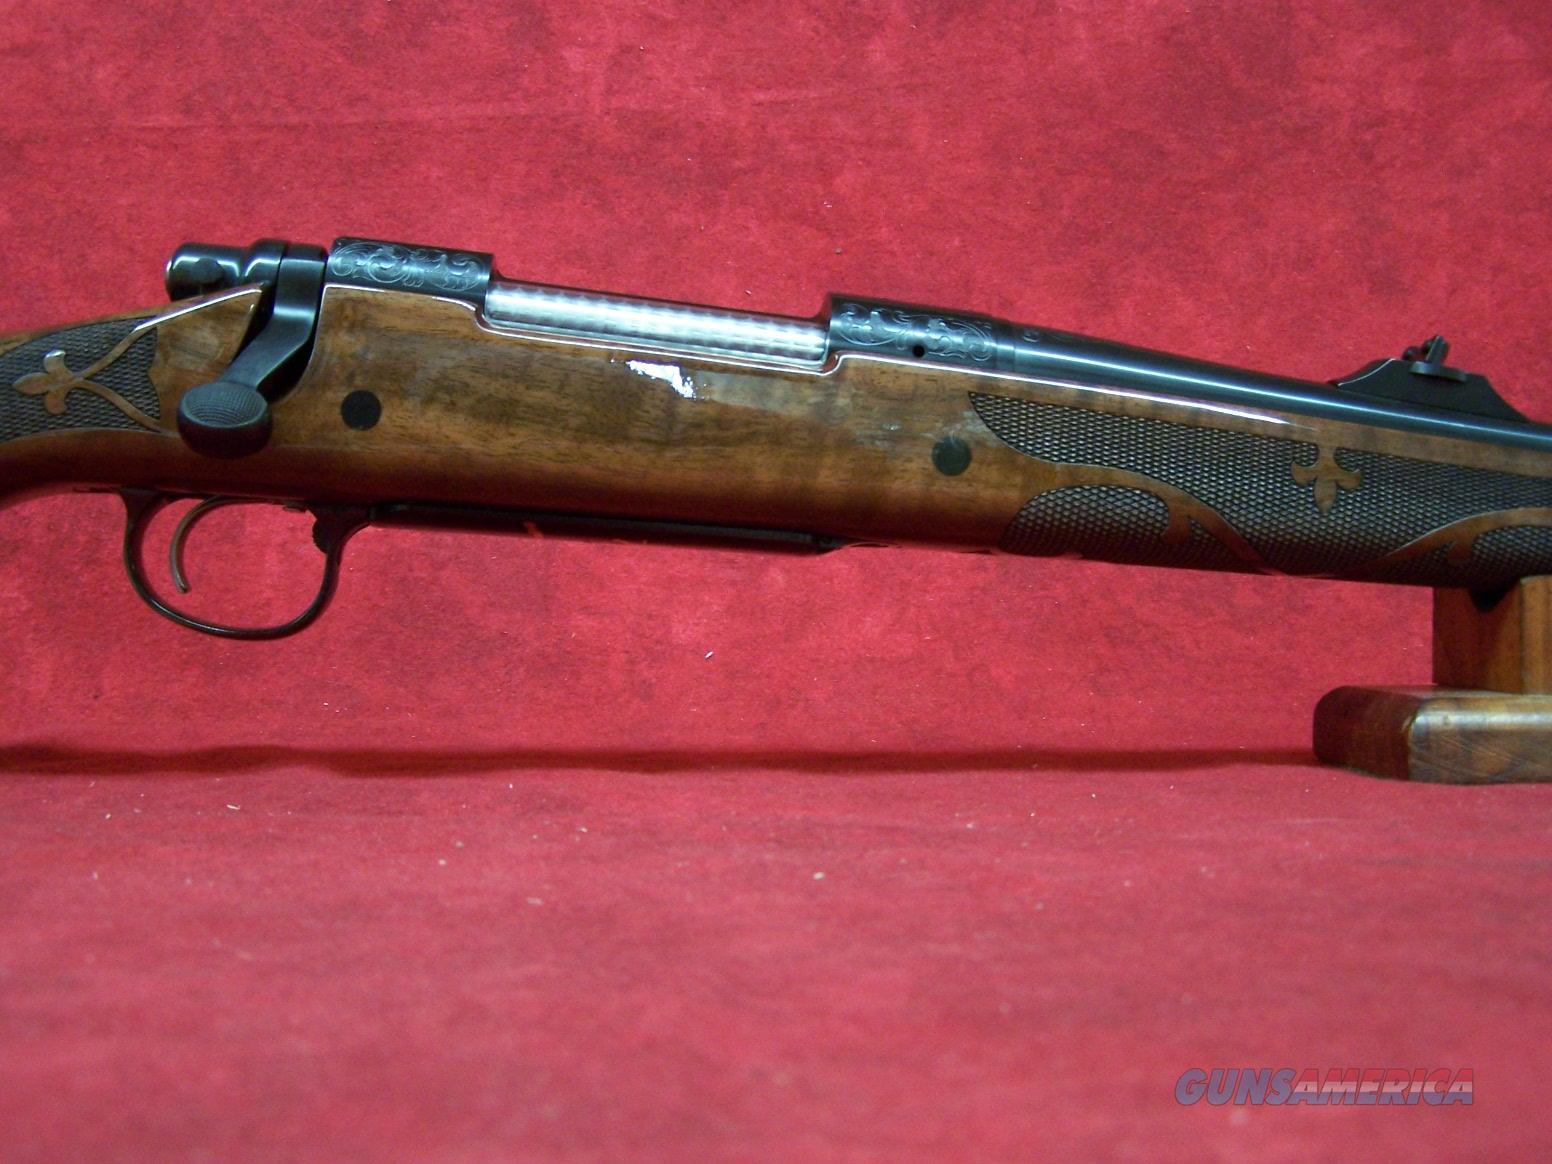 "Remington 700 Limited Edition 200th Anniversary Engraved 7mm Remington Magnum 24"" Barrel Rifle Sights Walnut Stock (84042)  Guns > Rifles > Remington Rifles - Modern > Model 700 > Sporting"